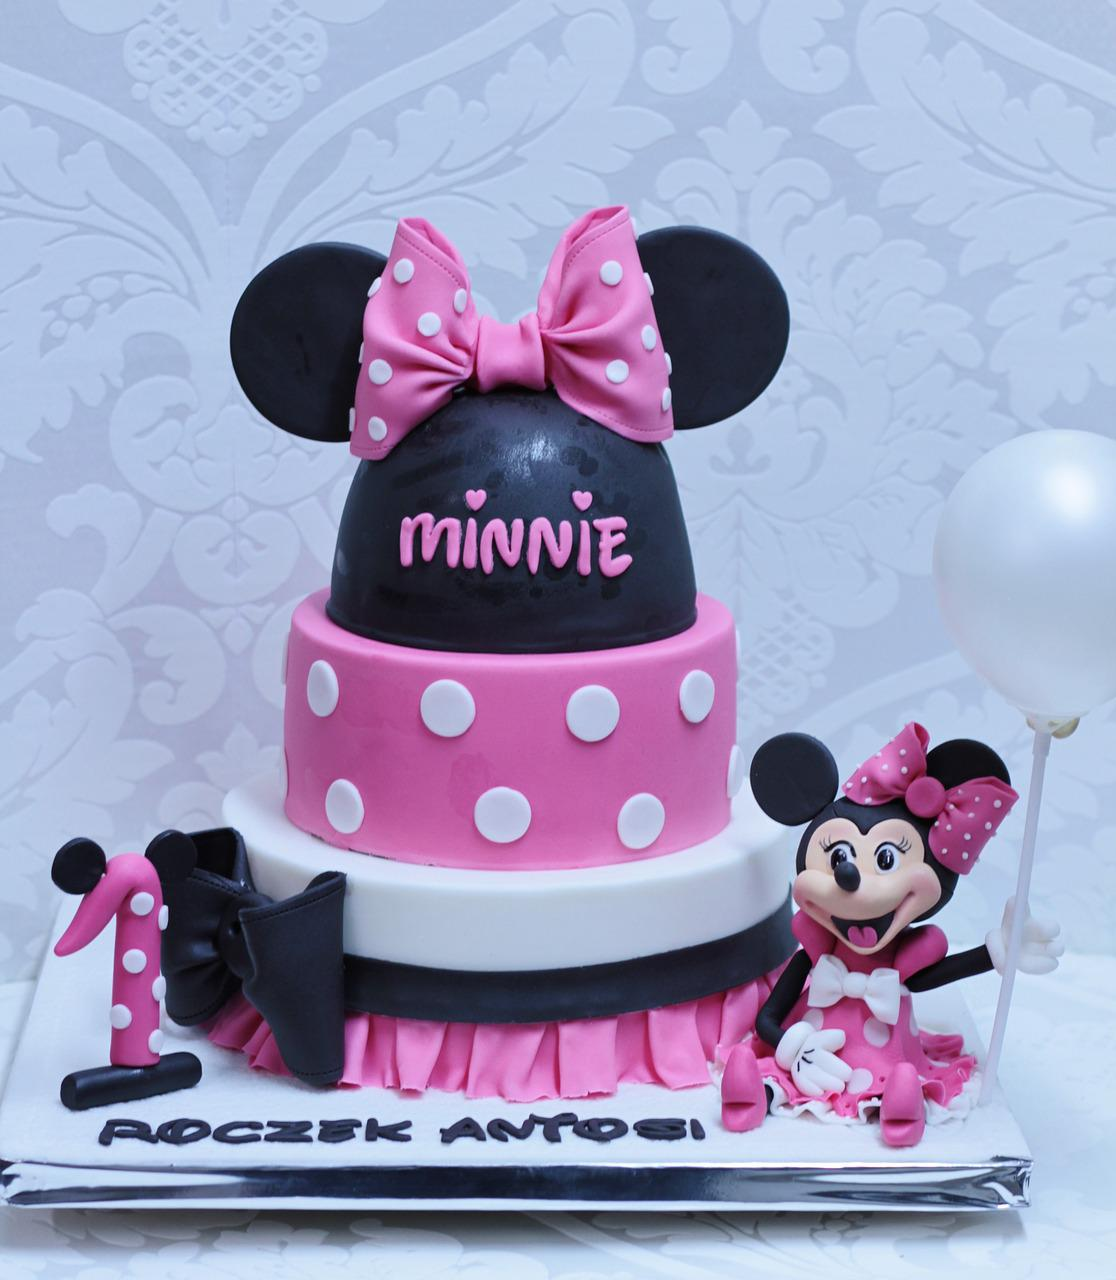 Super Cake One Year Old Birthday Free Photo On Pixabay Funny Birthday Cards Online Inifodamsfinfo